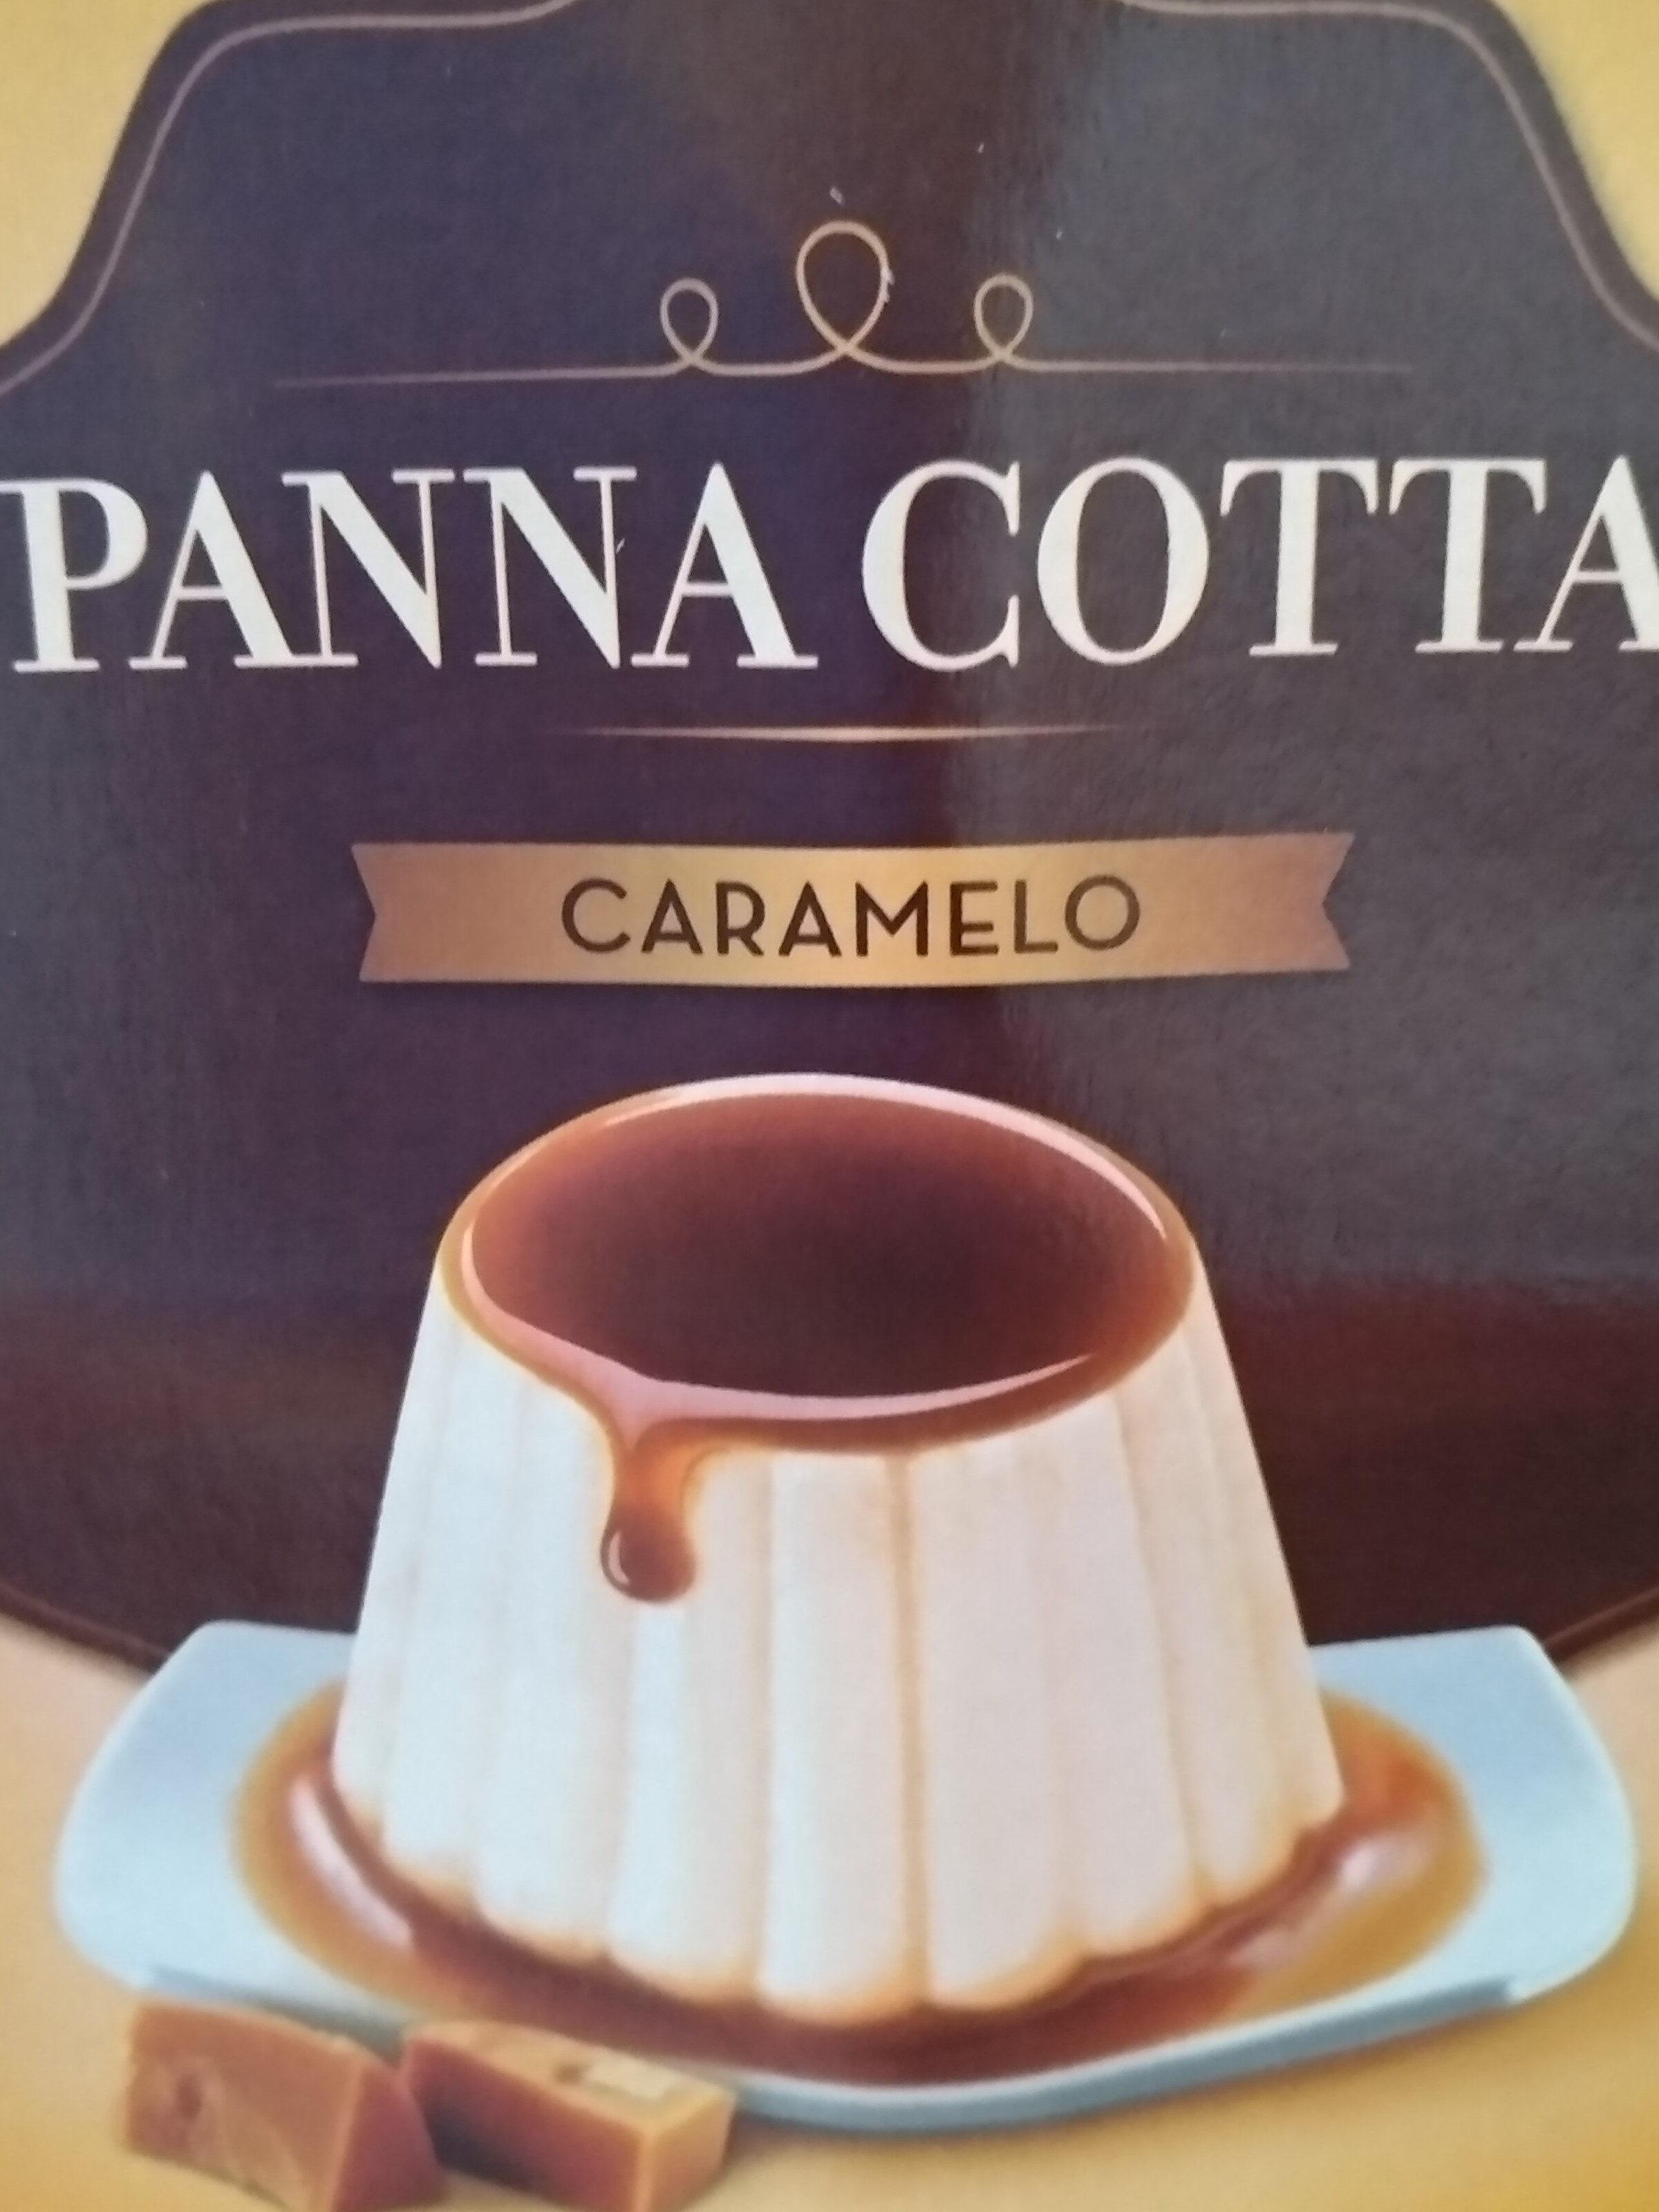 Panna Cotta Caramelo - Product